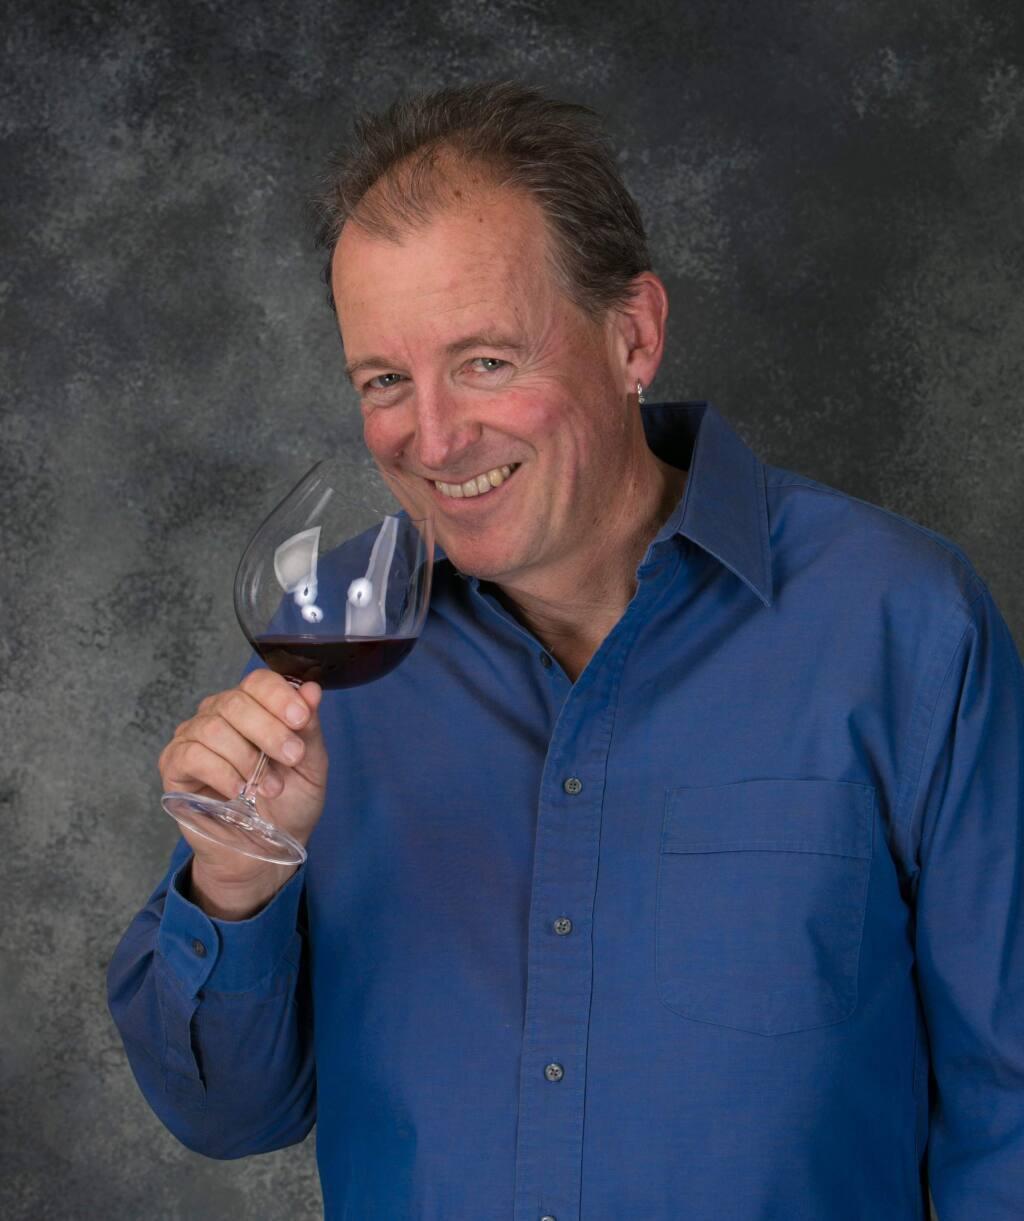 Vintner Nick Goldschmidt of his namesake winery in Healdsburg. (Goldschmidt Vineyards)